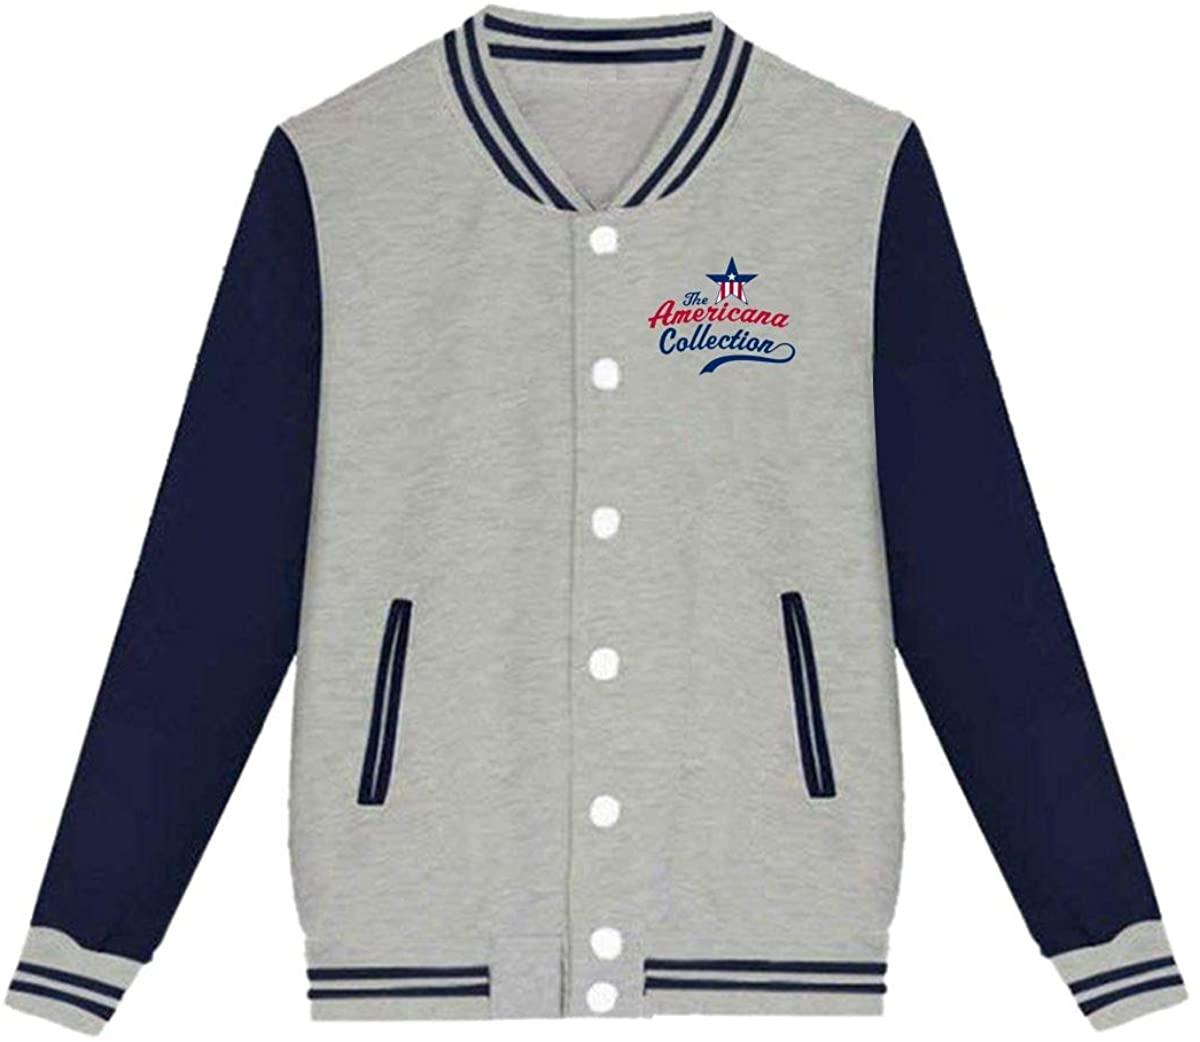 Americana Collection Baseball Jacket,Unisex Custom Varsity Jacket Baseball Jacket Uniform Sweater Coat